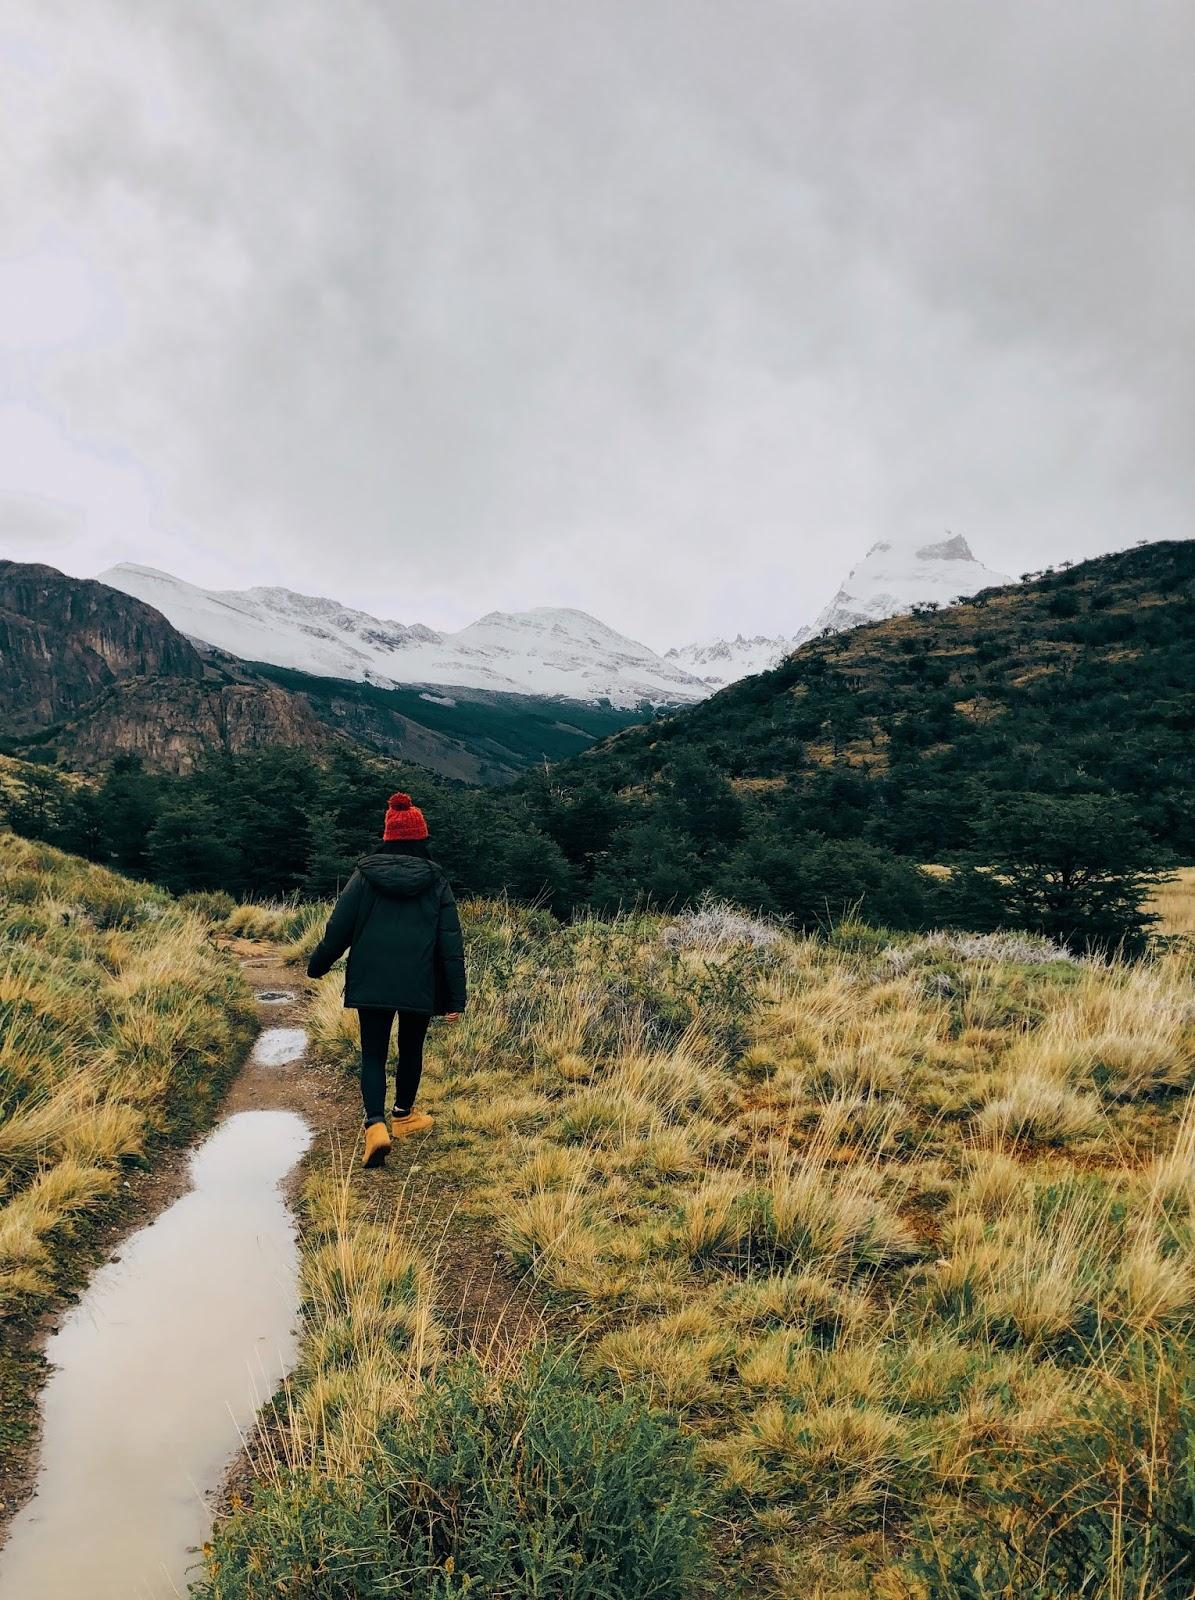 Chaltén, Argentina - ¿Qué hacer en Chaltén? Guia completa